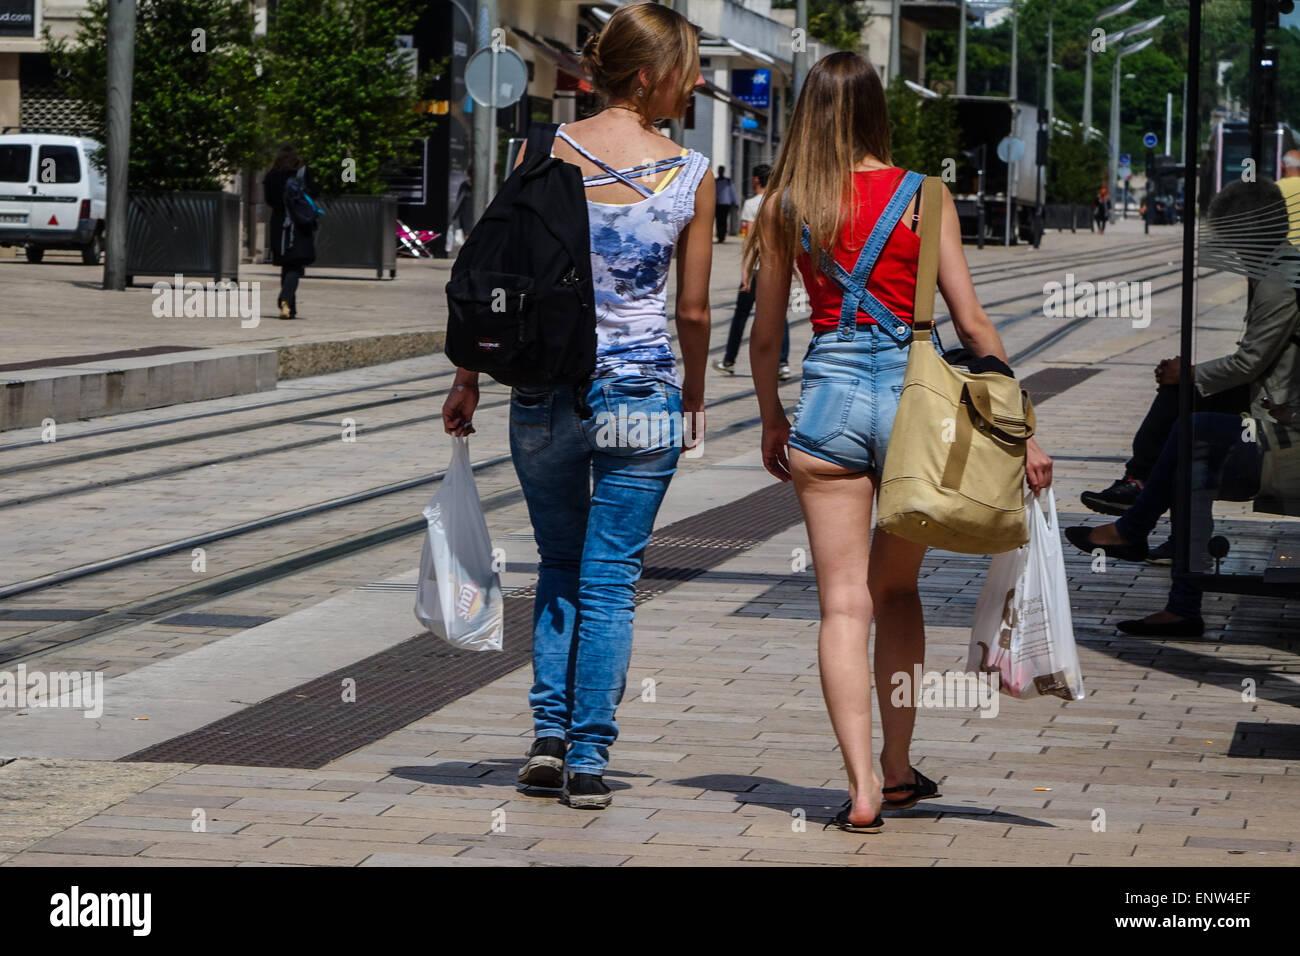 Tours, France, Two women walking along a street, one wearing revealing hot pants. Stock Photo